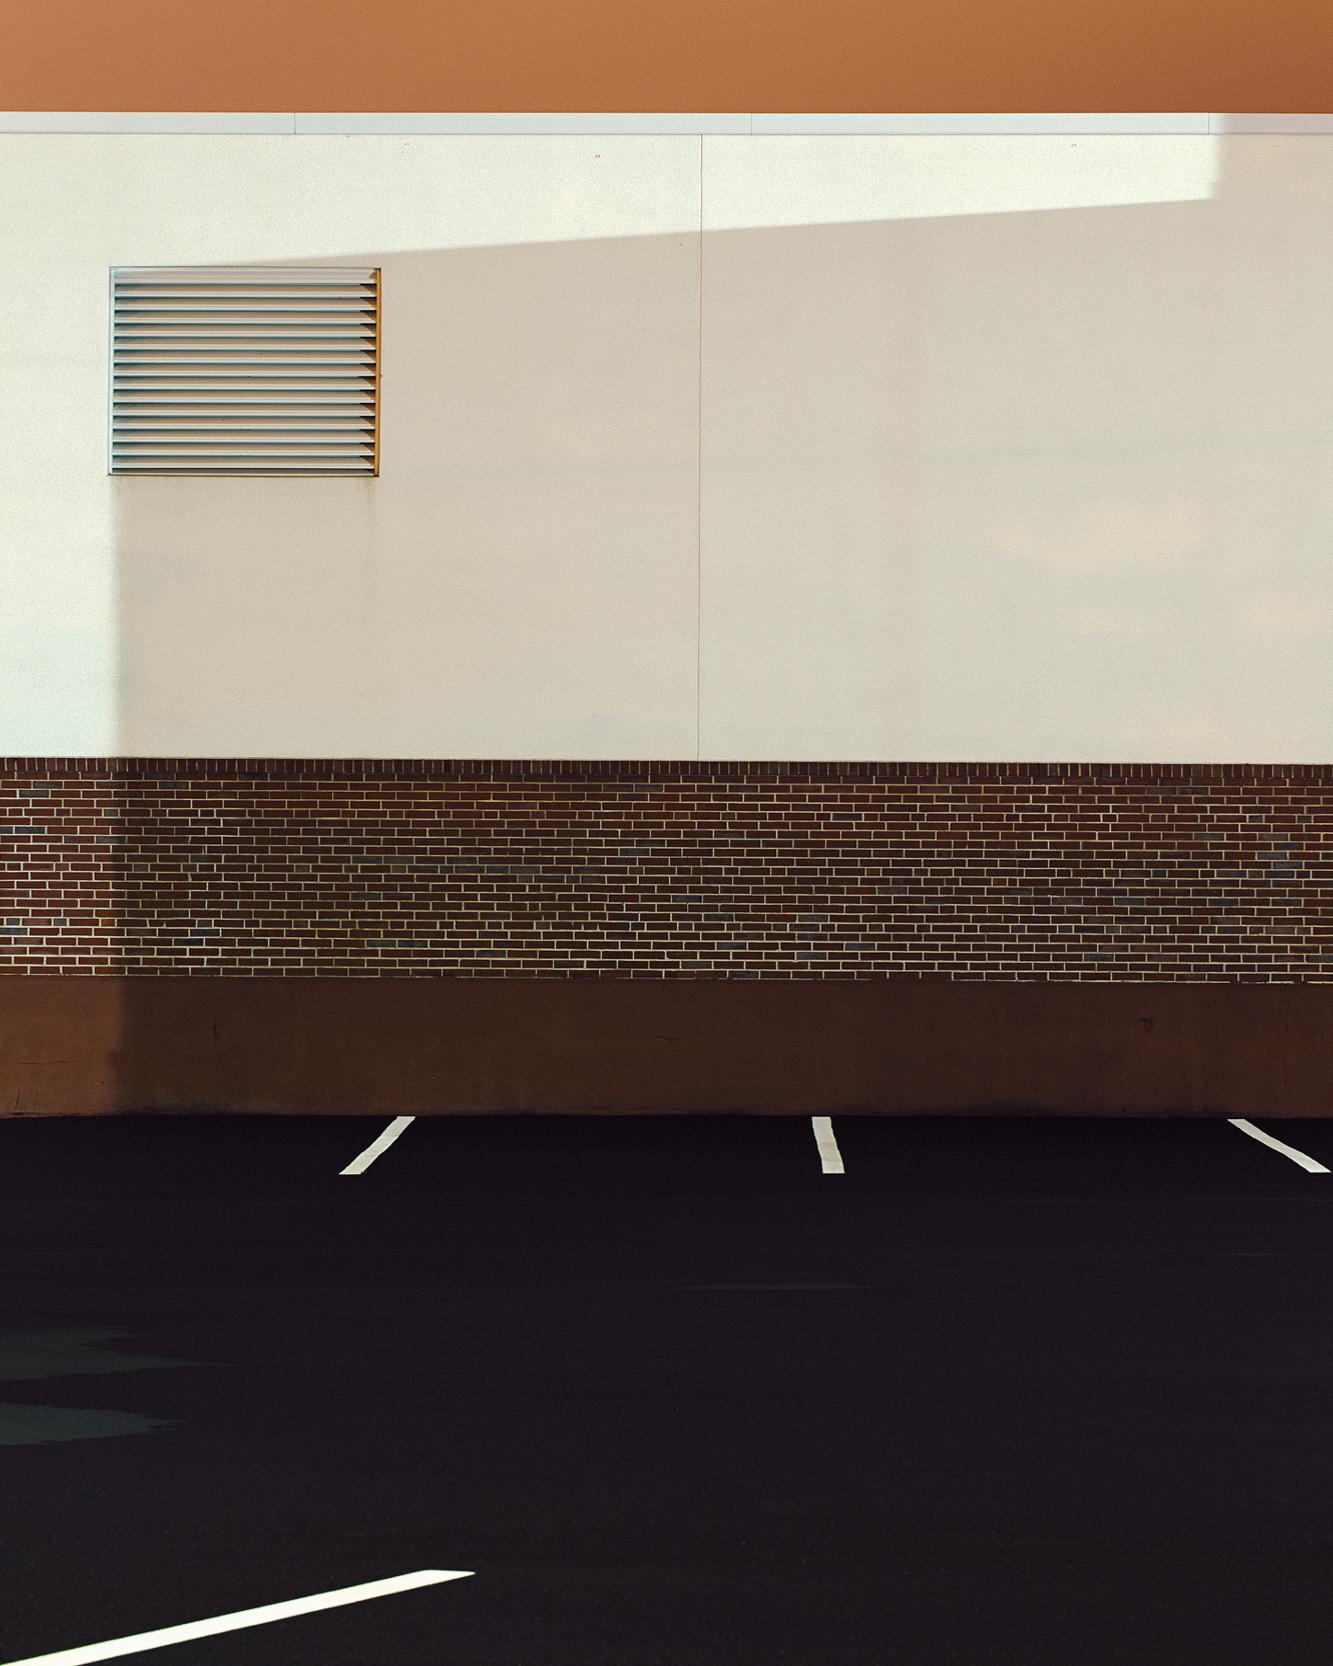 Brick_and_glass-Paul_Puiia-2.jpg